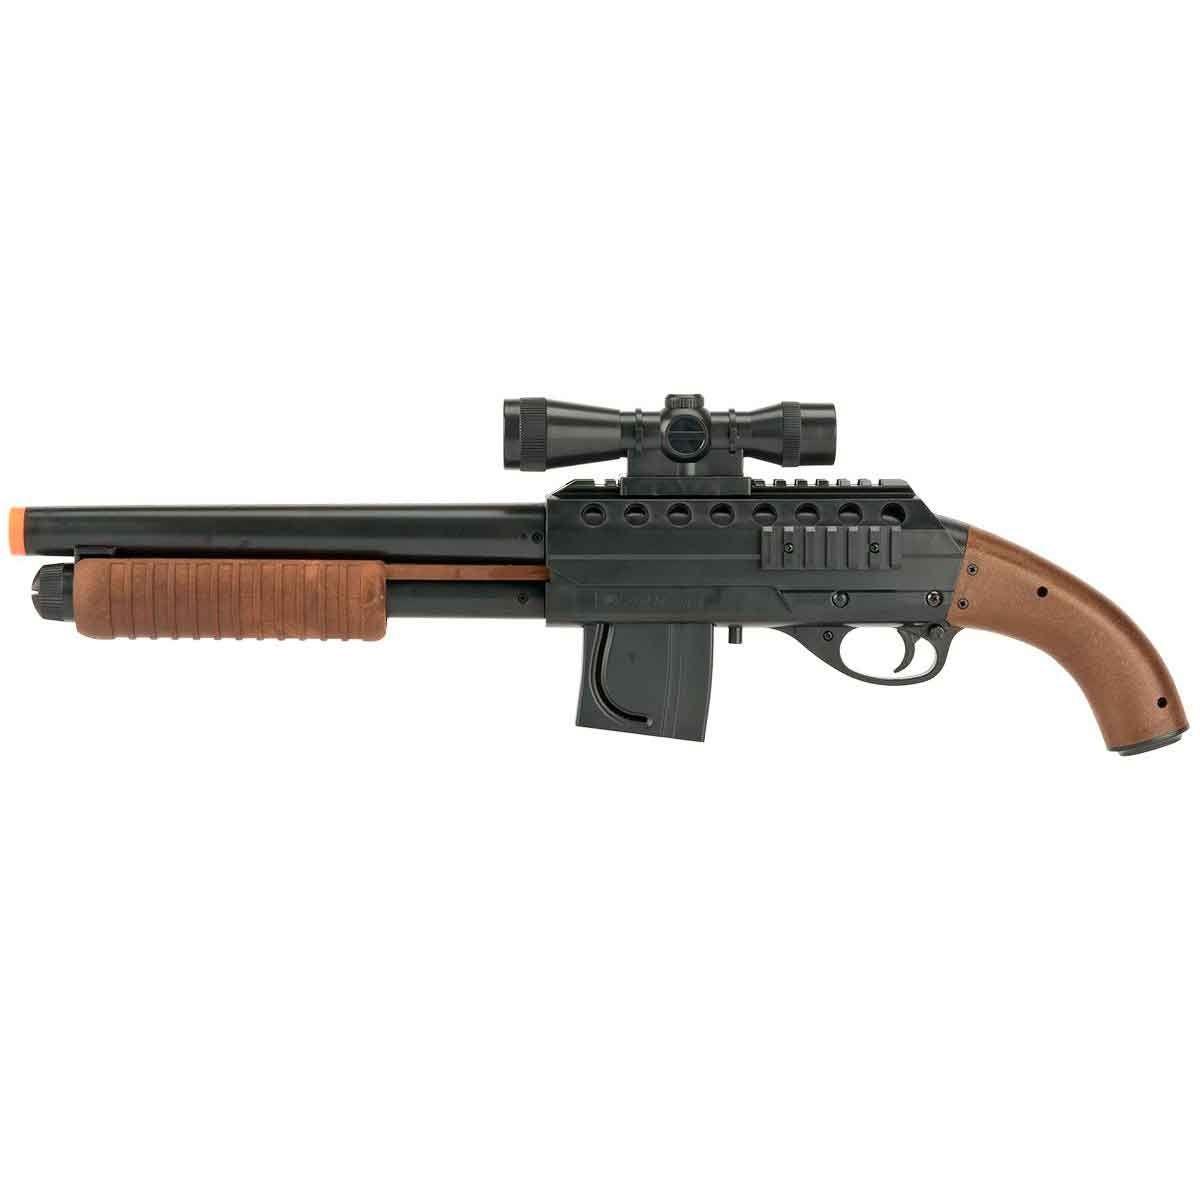 Airsoft Shotgun Cybergun Smith Wesson Mossberg M3000 Pistol Grip + Lanterna E Luneta Fake